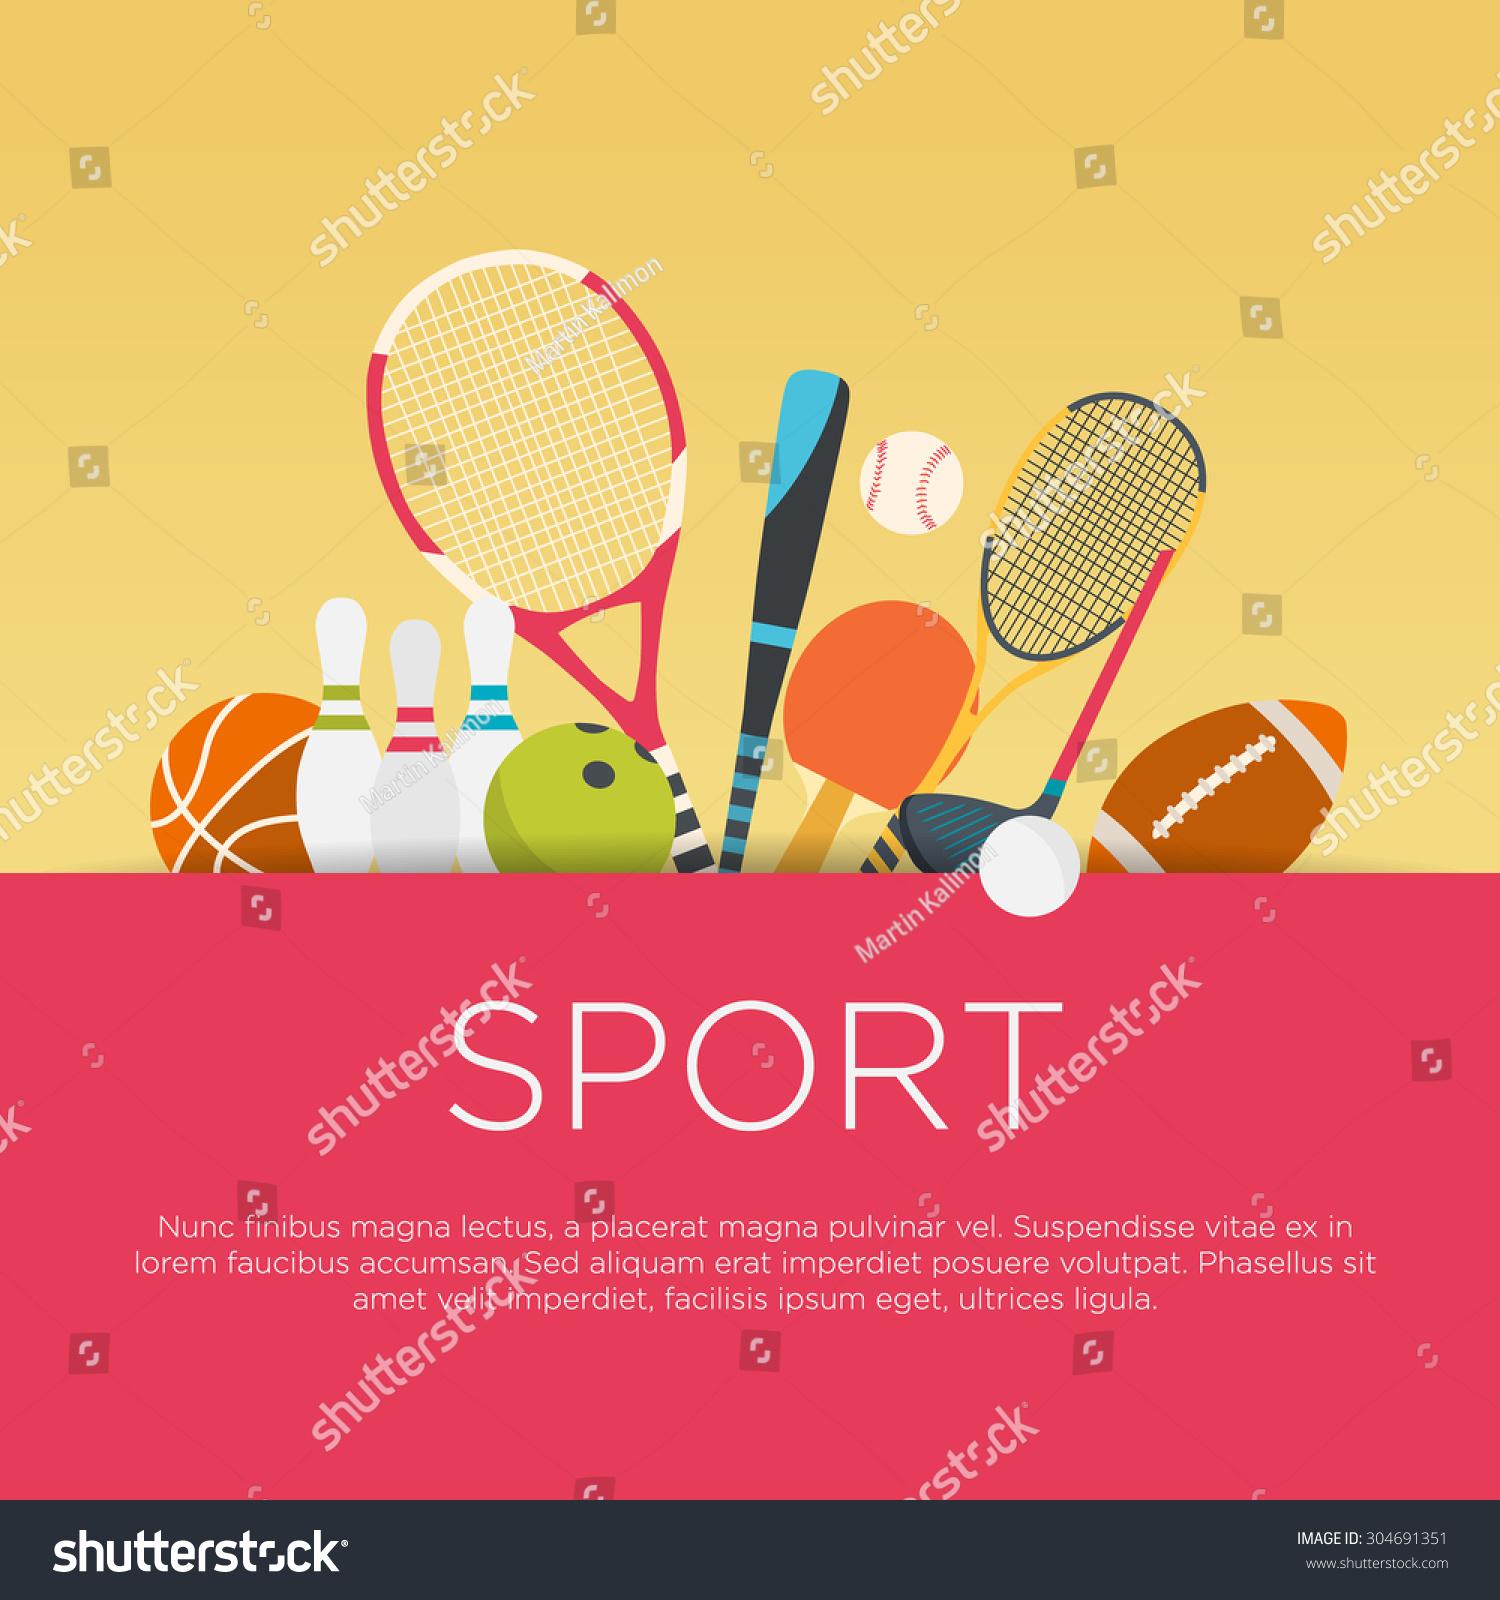 sports background designs - photo #29